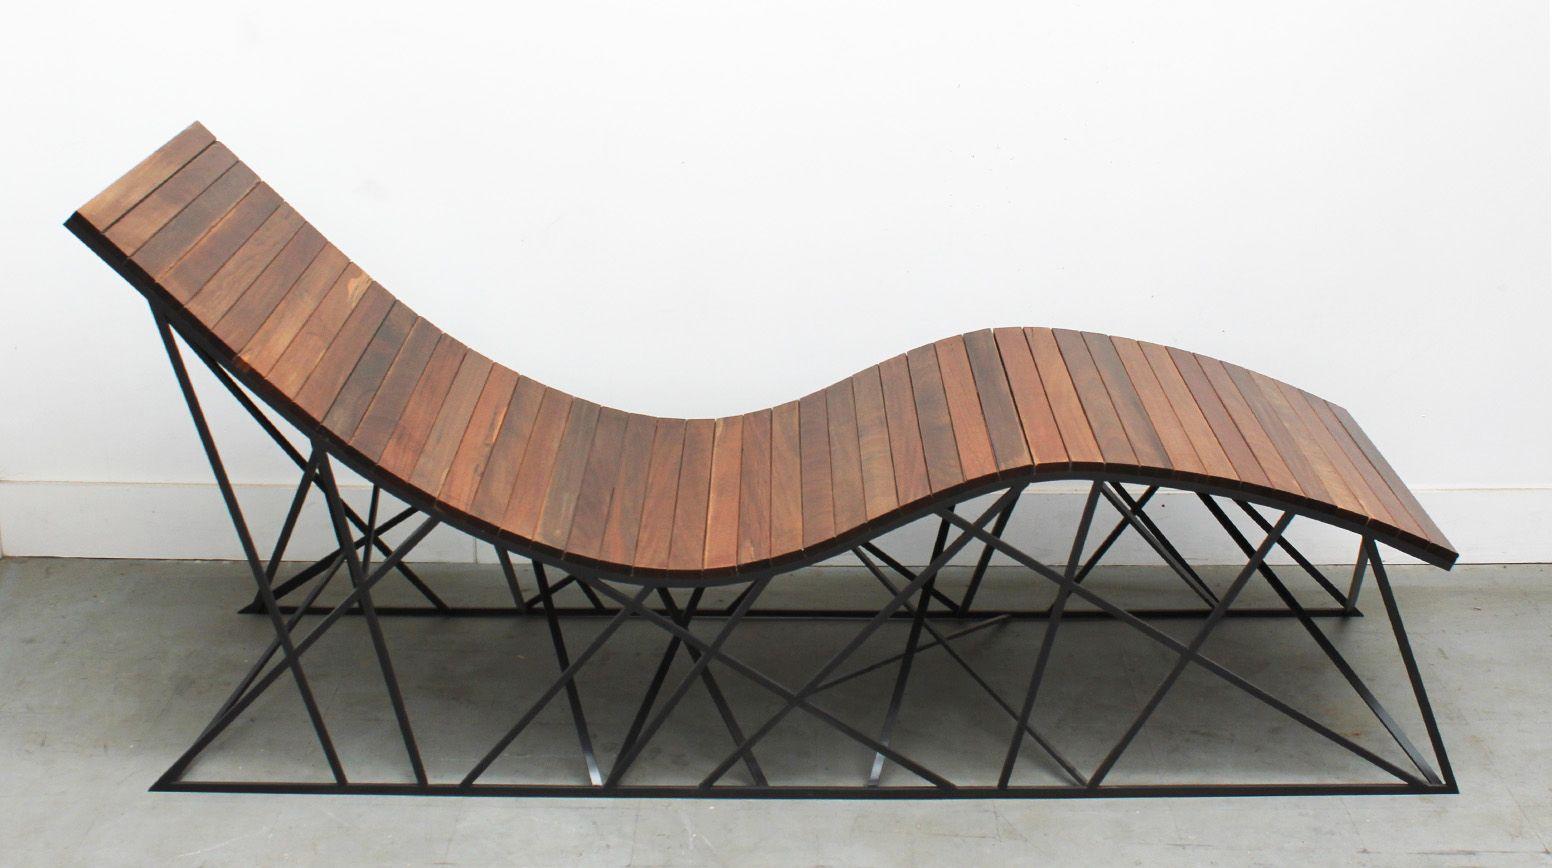 DesignModern Home FurnitureDesign amp;e LoungerFf Cyclone Furniture xedQBrCWo